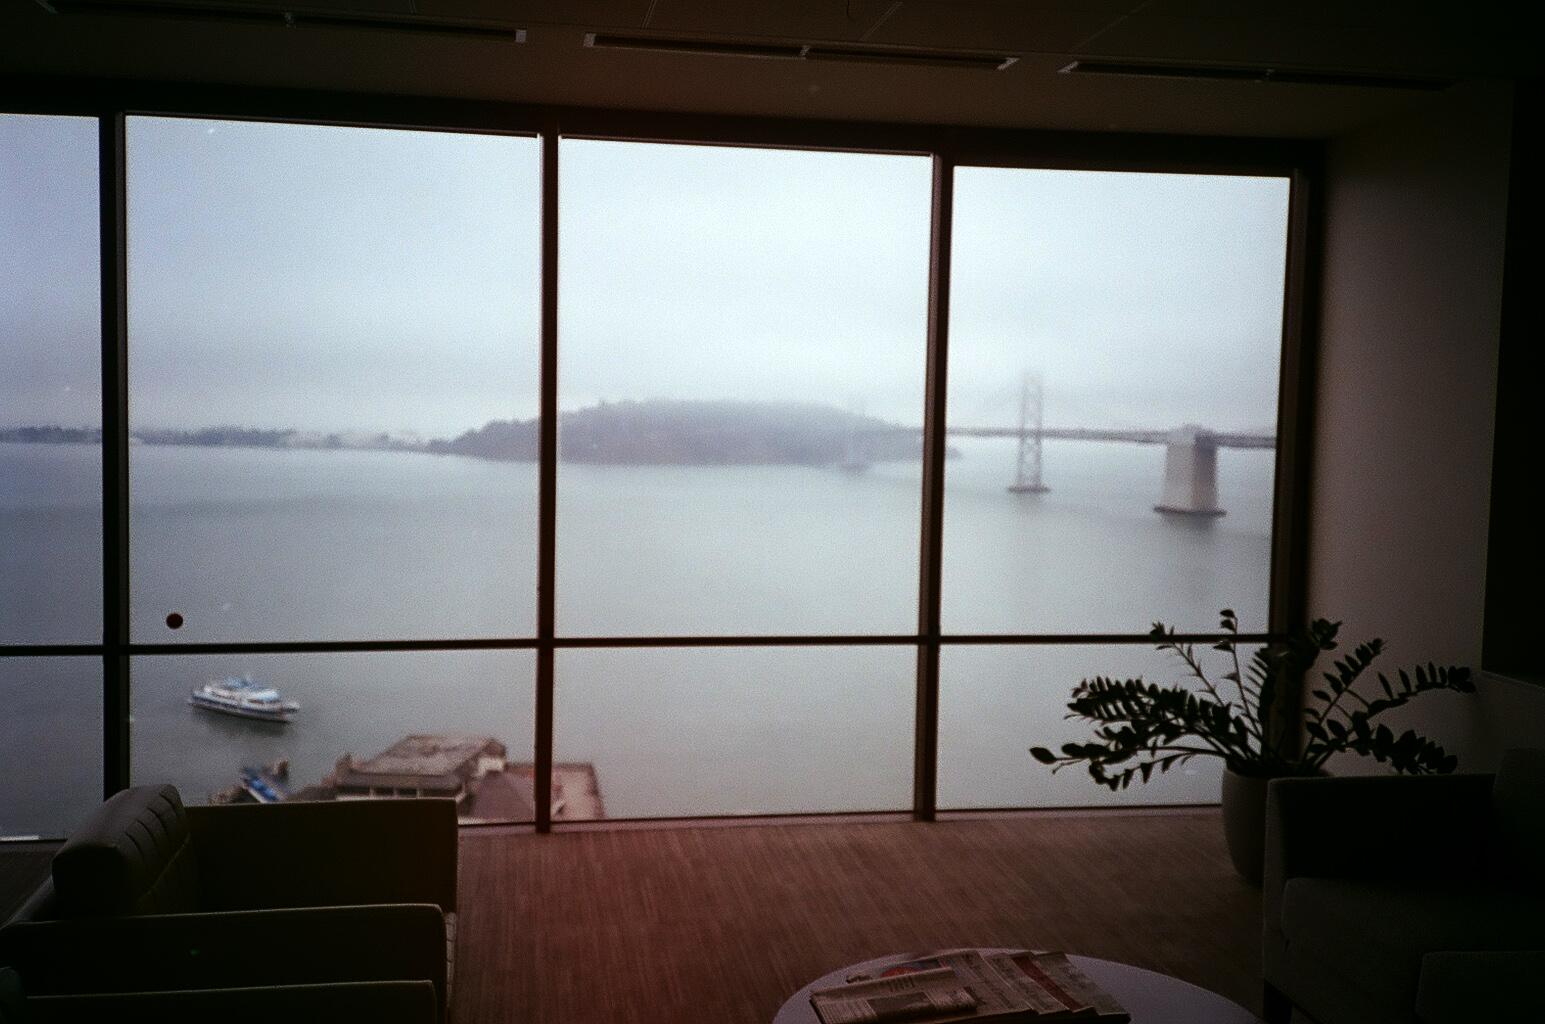 View of Bay Bridge in the fog